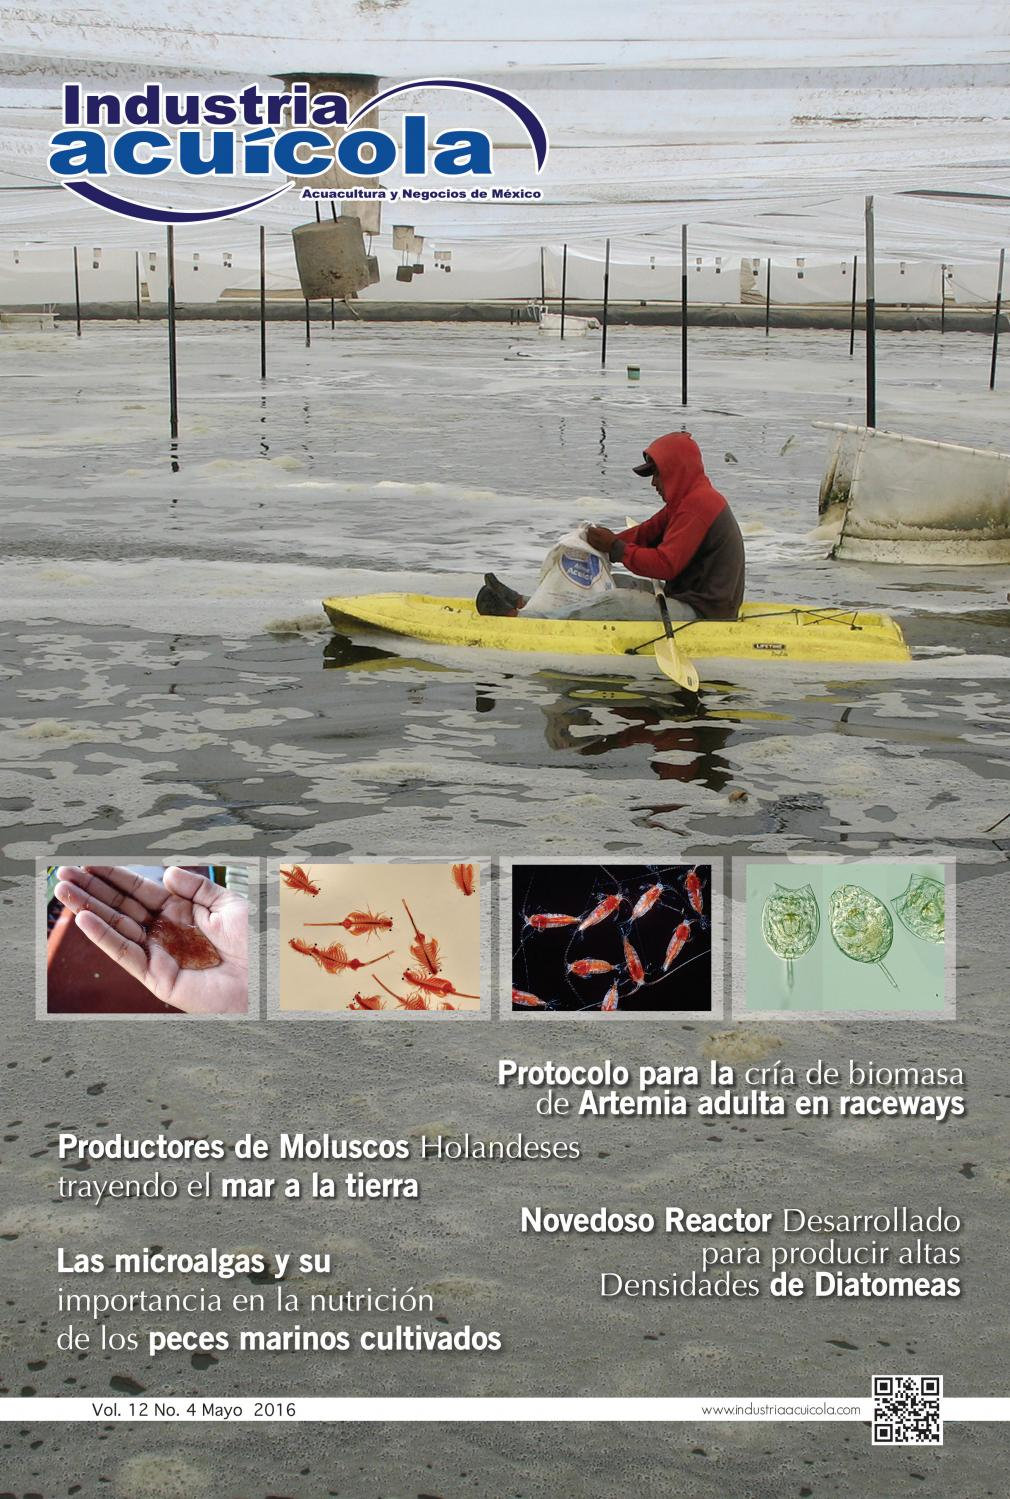 Revista industria acuicola 12 4 by aqua negocios sa de cv for Tipos de estanques para acuicultura